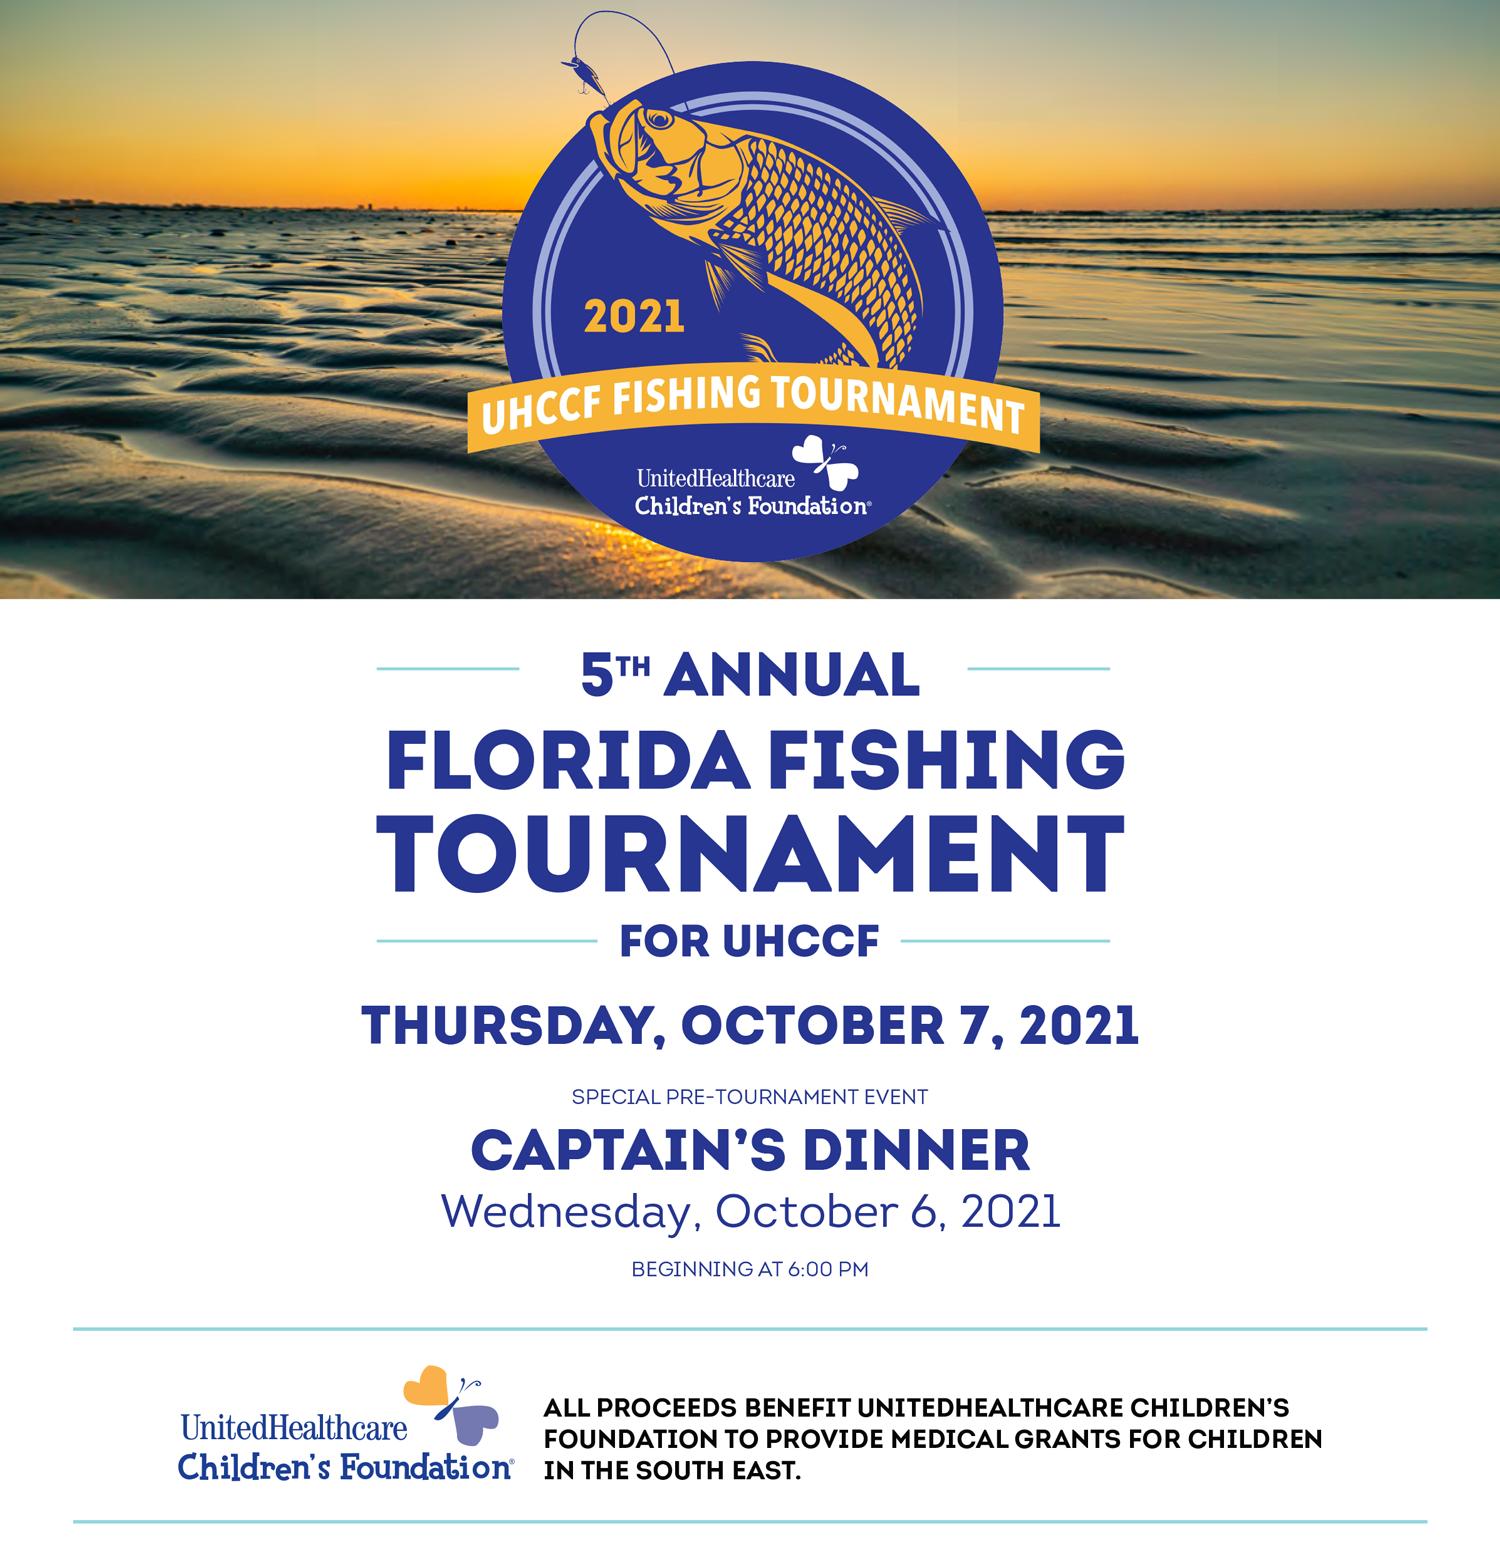 FL-Fishing-Flyer--image